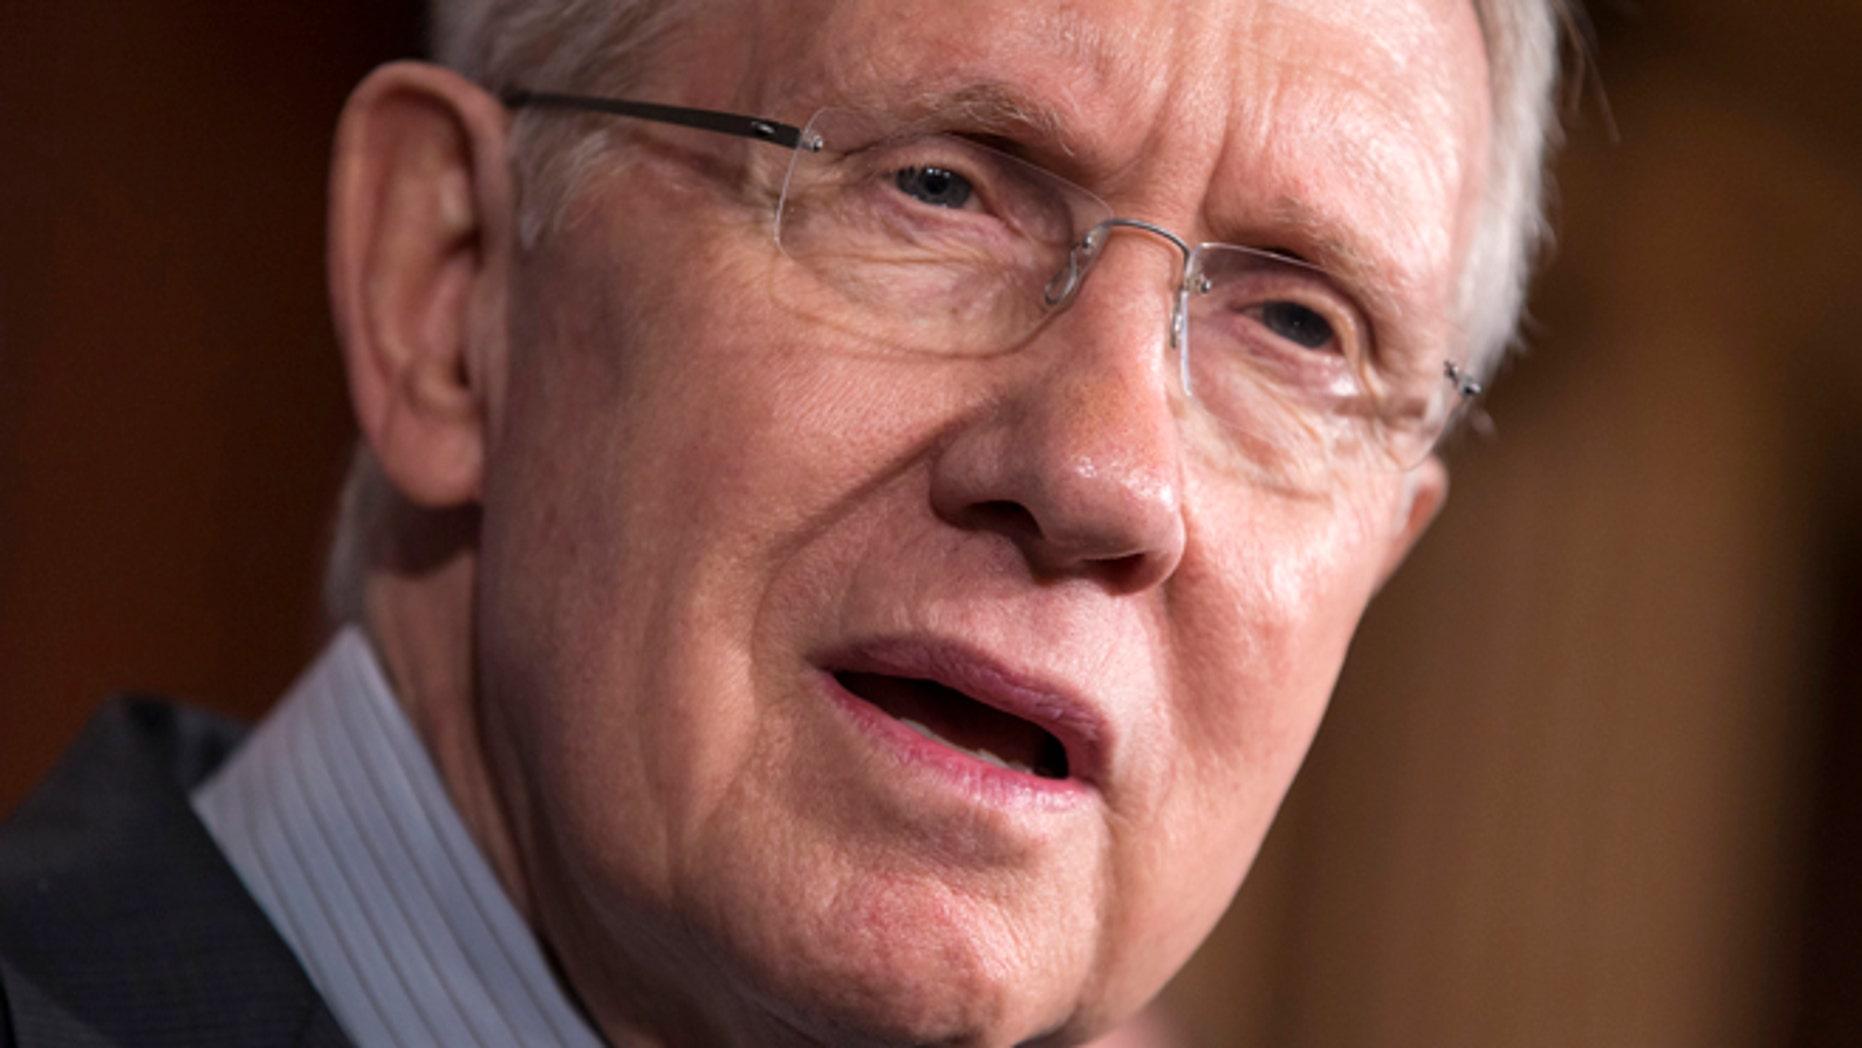 Oct. 3, 2013: Senate Majority Leader Harry Reid speaks on Capitol Hill in Washington.